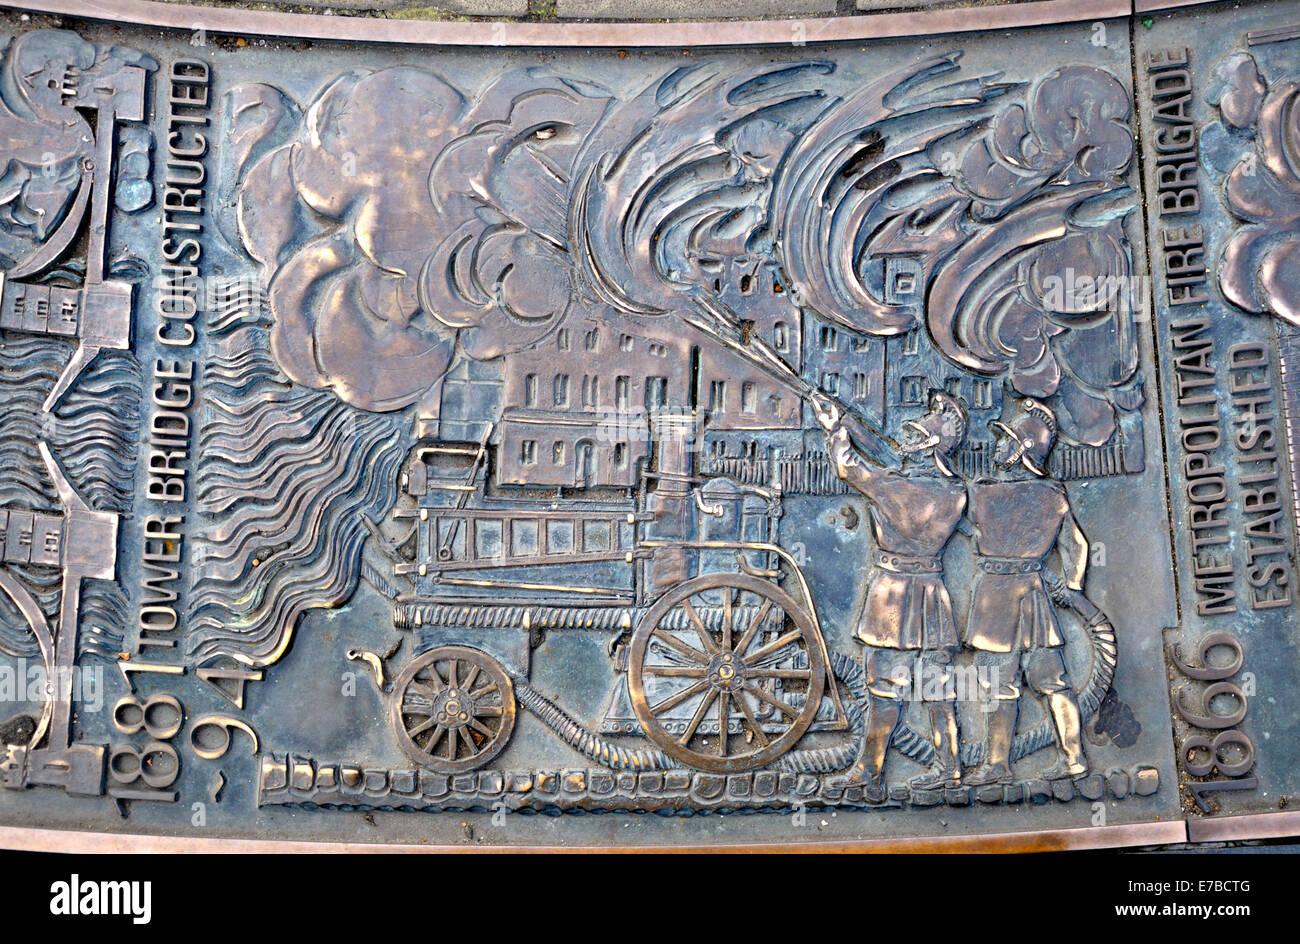 London, England, UK. Sundial (by John Chitty and Edwin Russellat) Tower Hill History of London. Metropolitan Fire - Stock Image